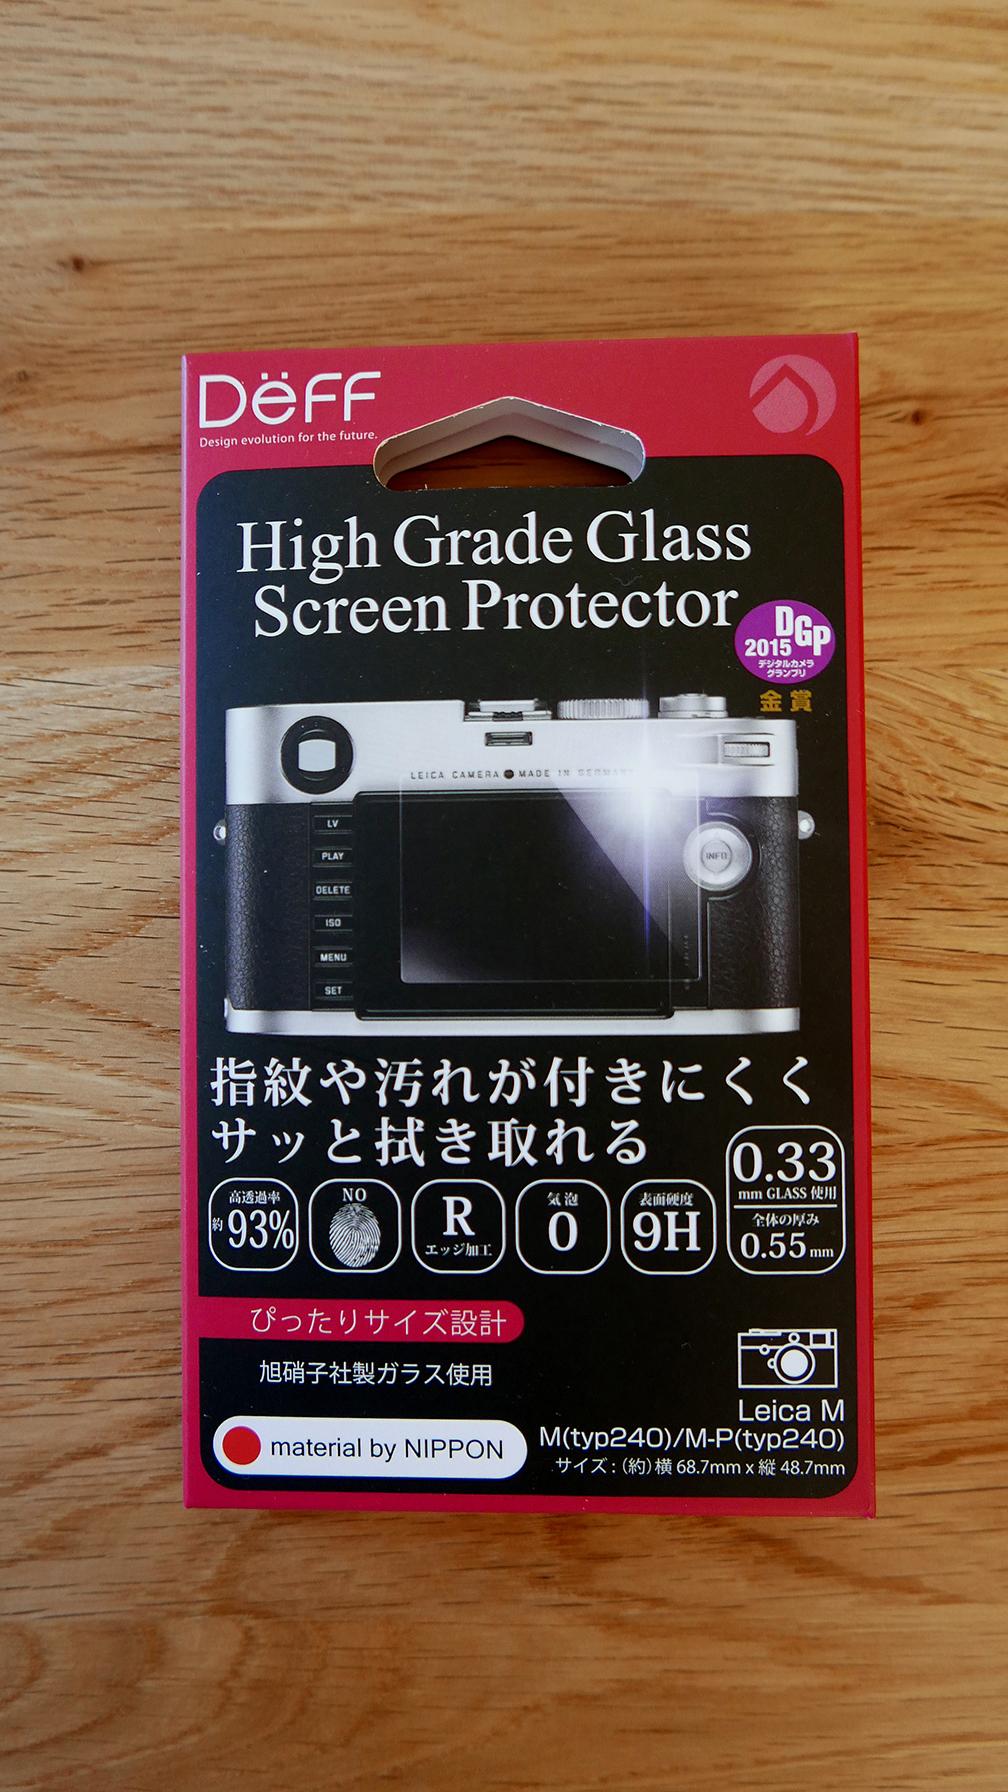 DeFF High Grade Glass Screen Protecter